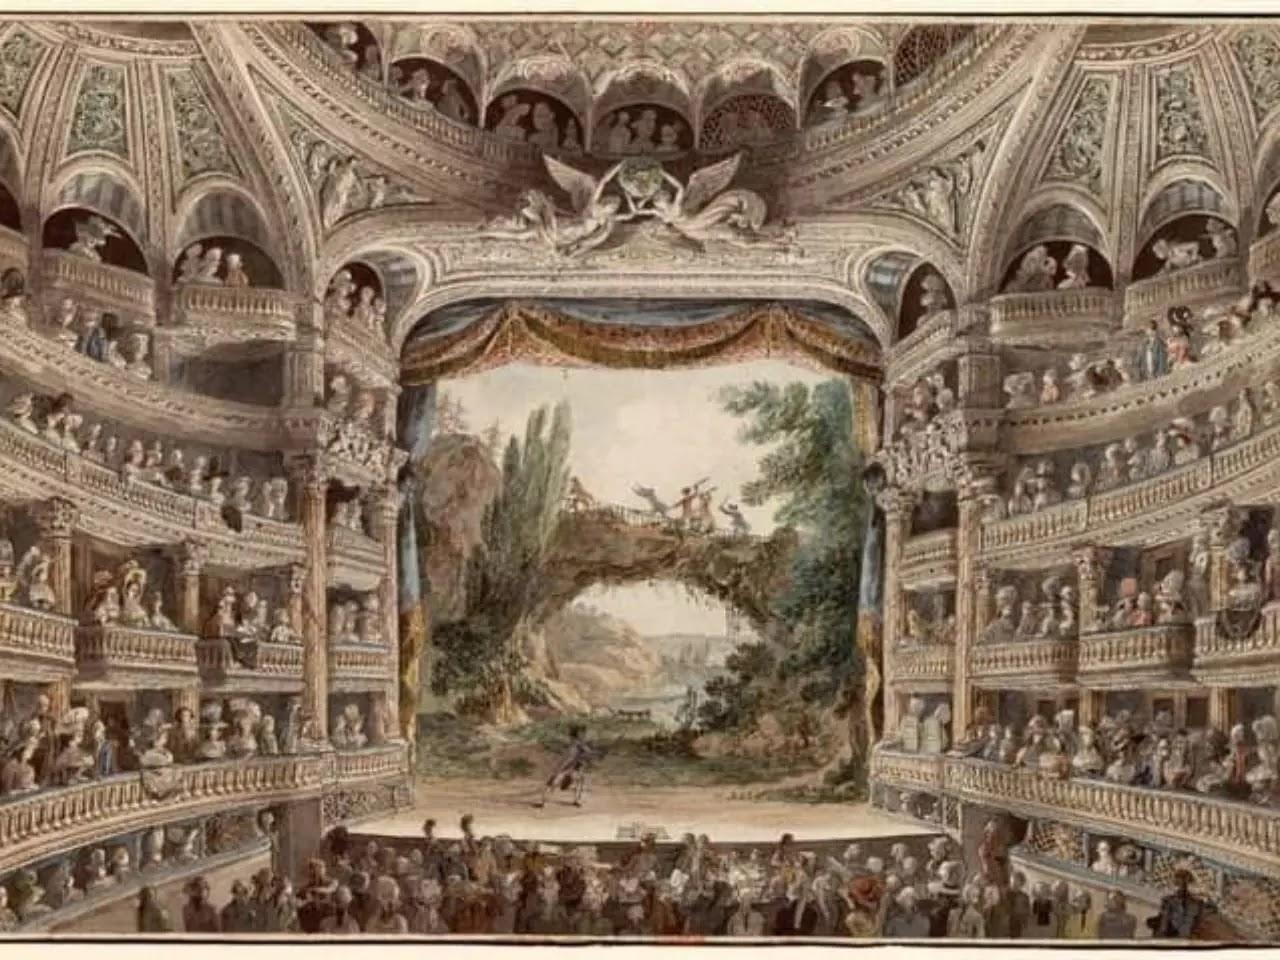 Sultan Abdülhamid II Pernah Melarang Prancis Tayangkan Teater Nabi Muhammad